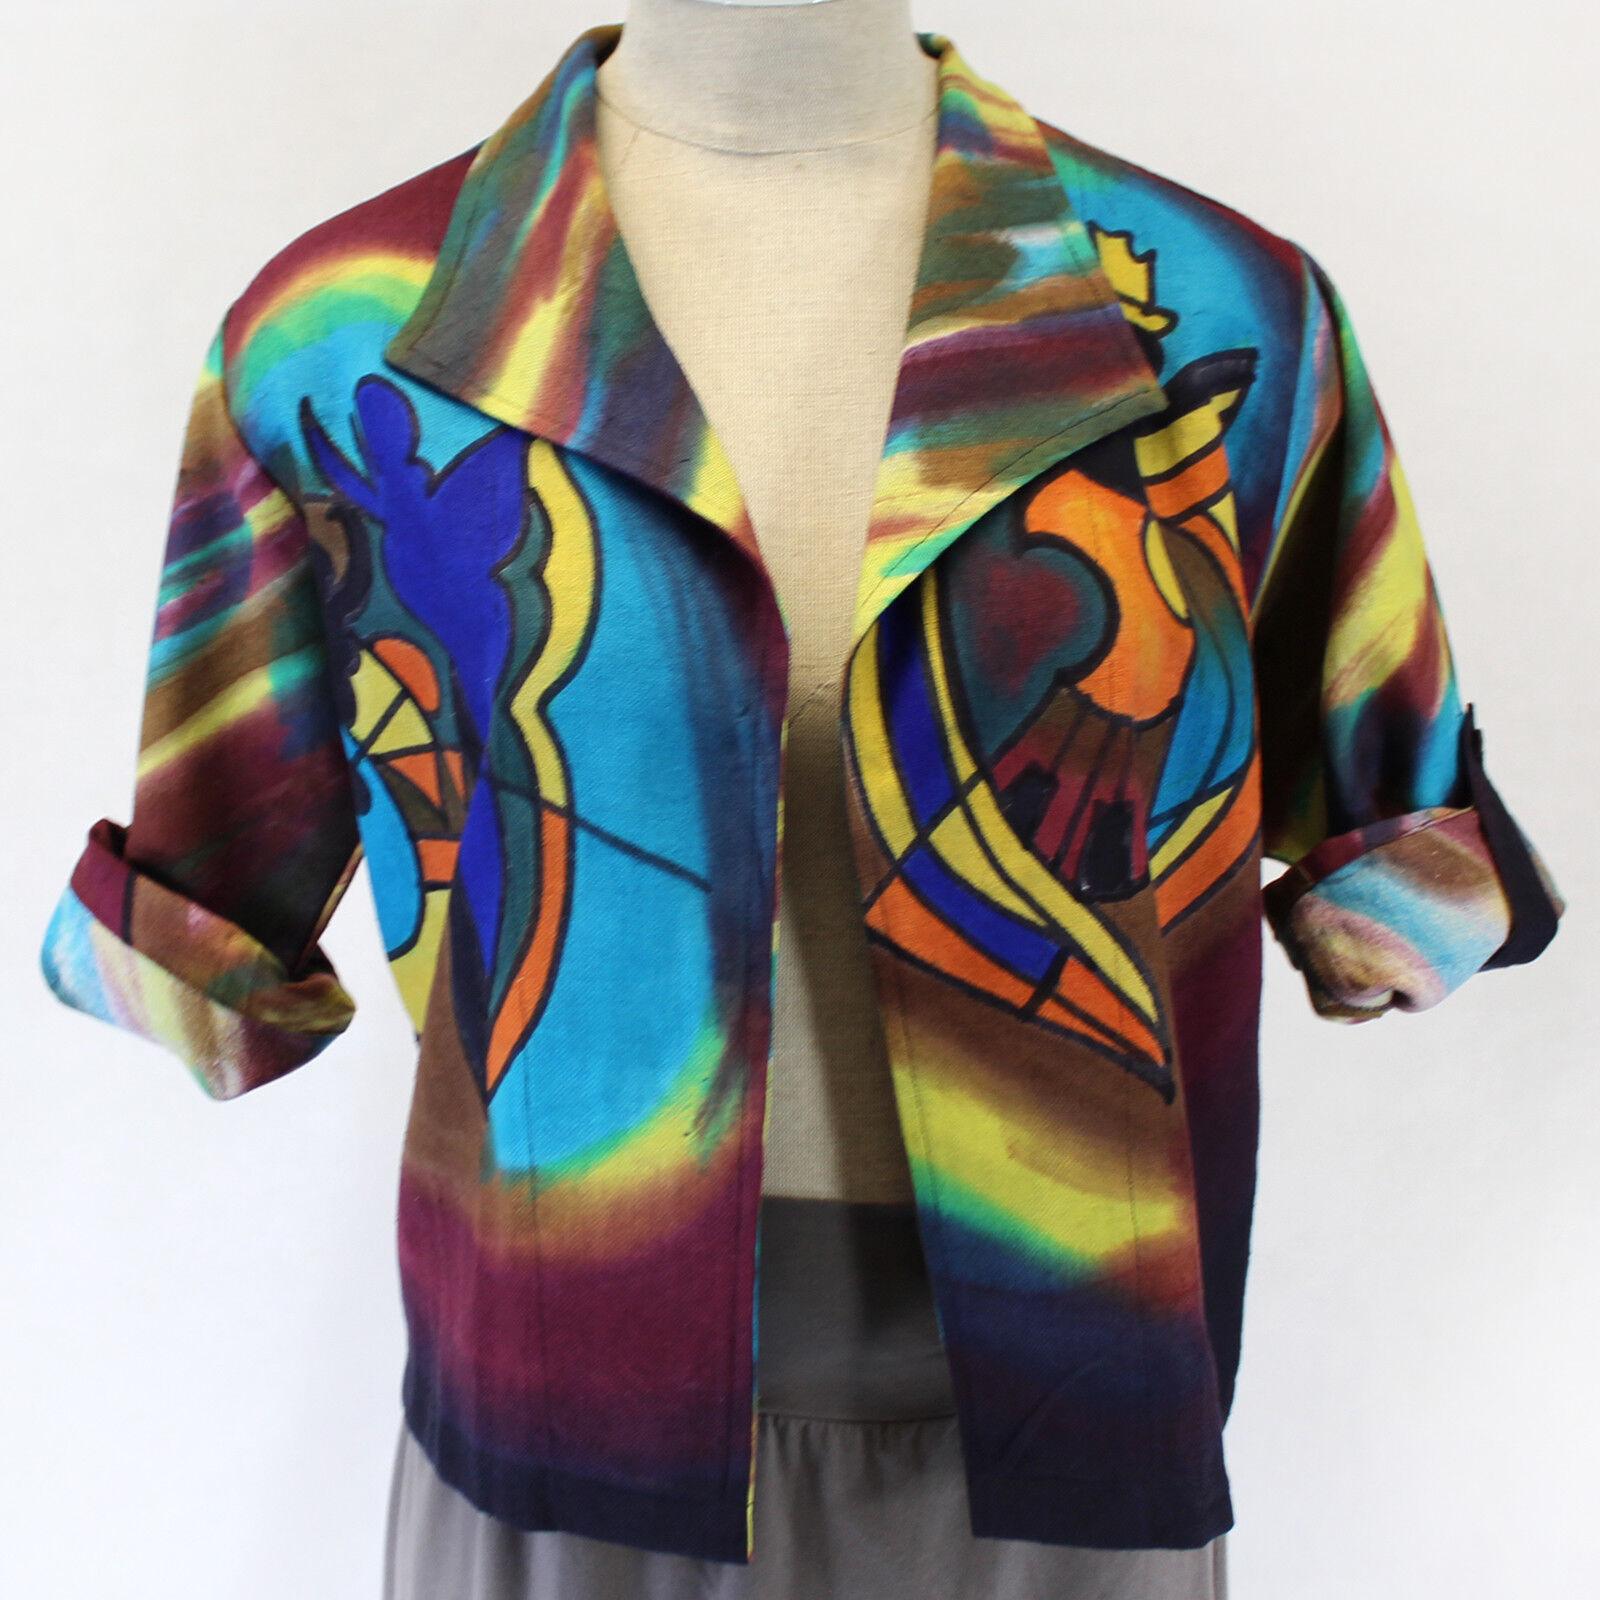 NEW Dilemma Plus Gockel Inspirot Raw Silk Heavy Cardigan Top OS fits XL 1X 2X